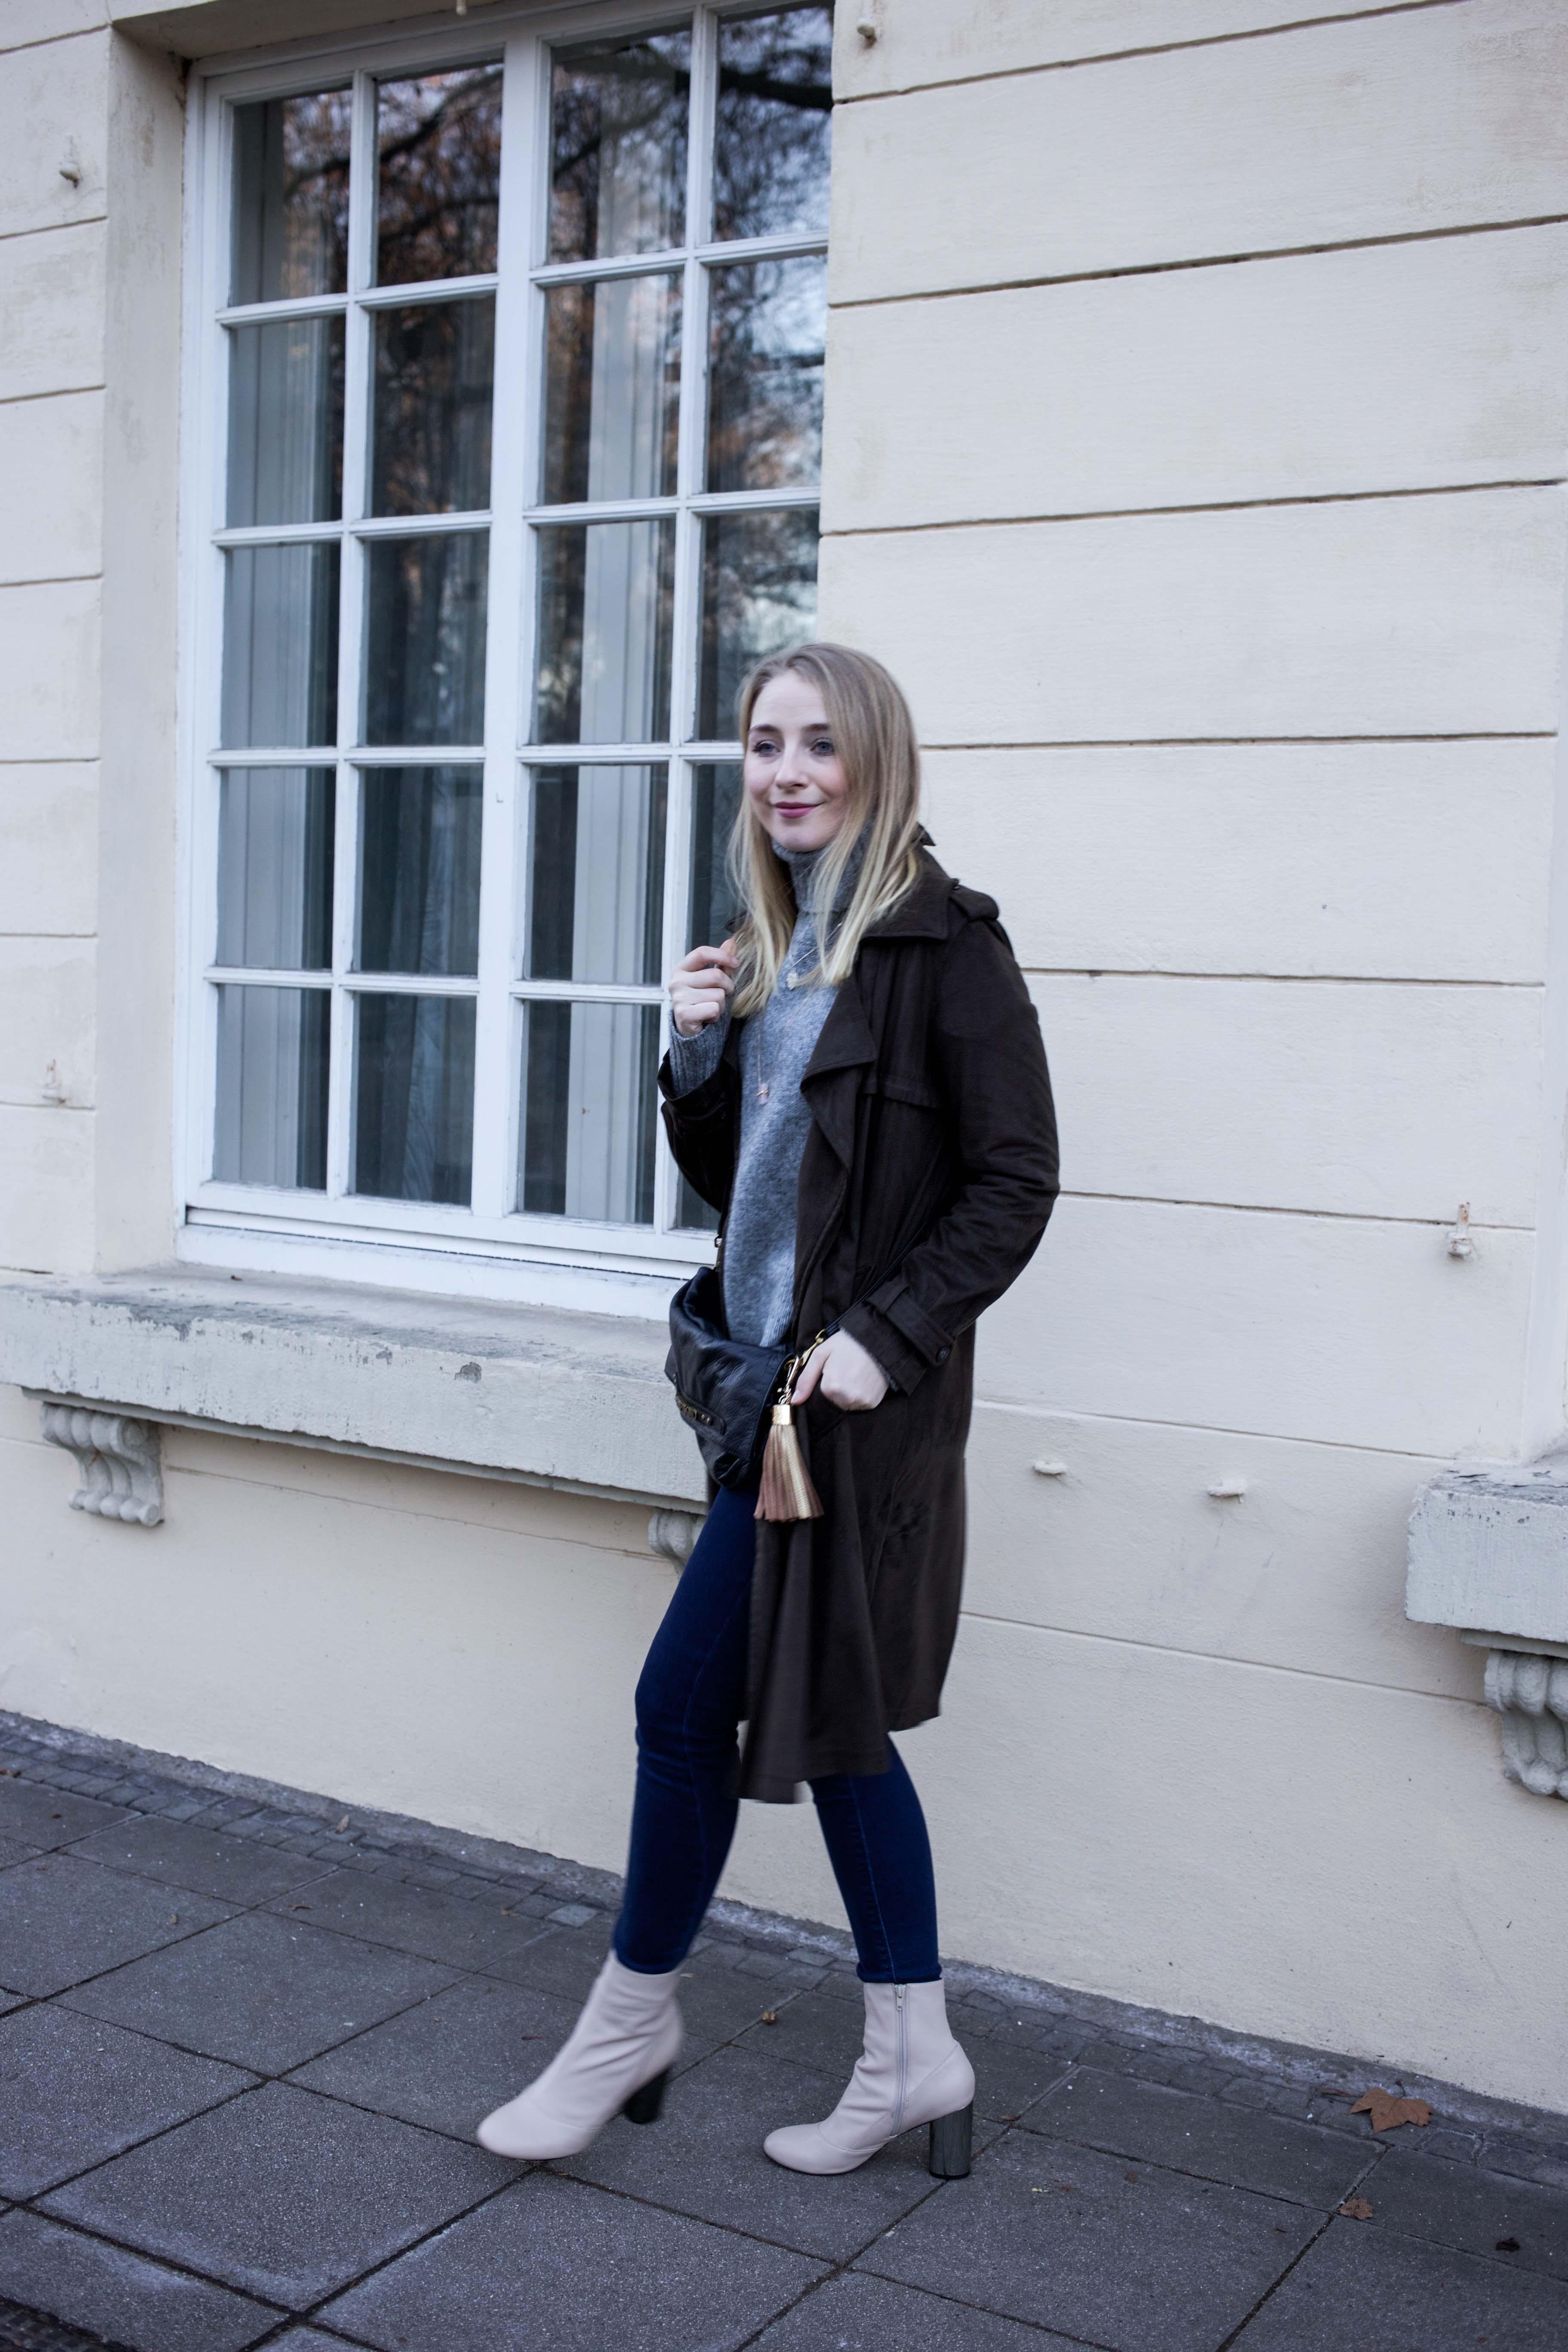 turtleneck-trench-coat-streetstyle-modeblog-fashionblog-bonn-berlin-köln-lederstiefel-silberabsatz-outfi_9229